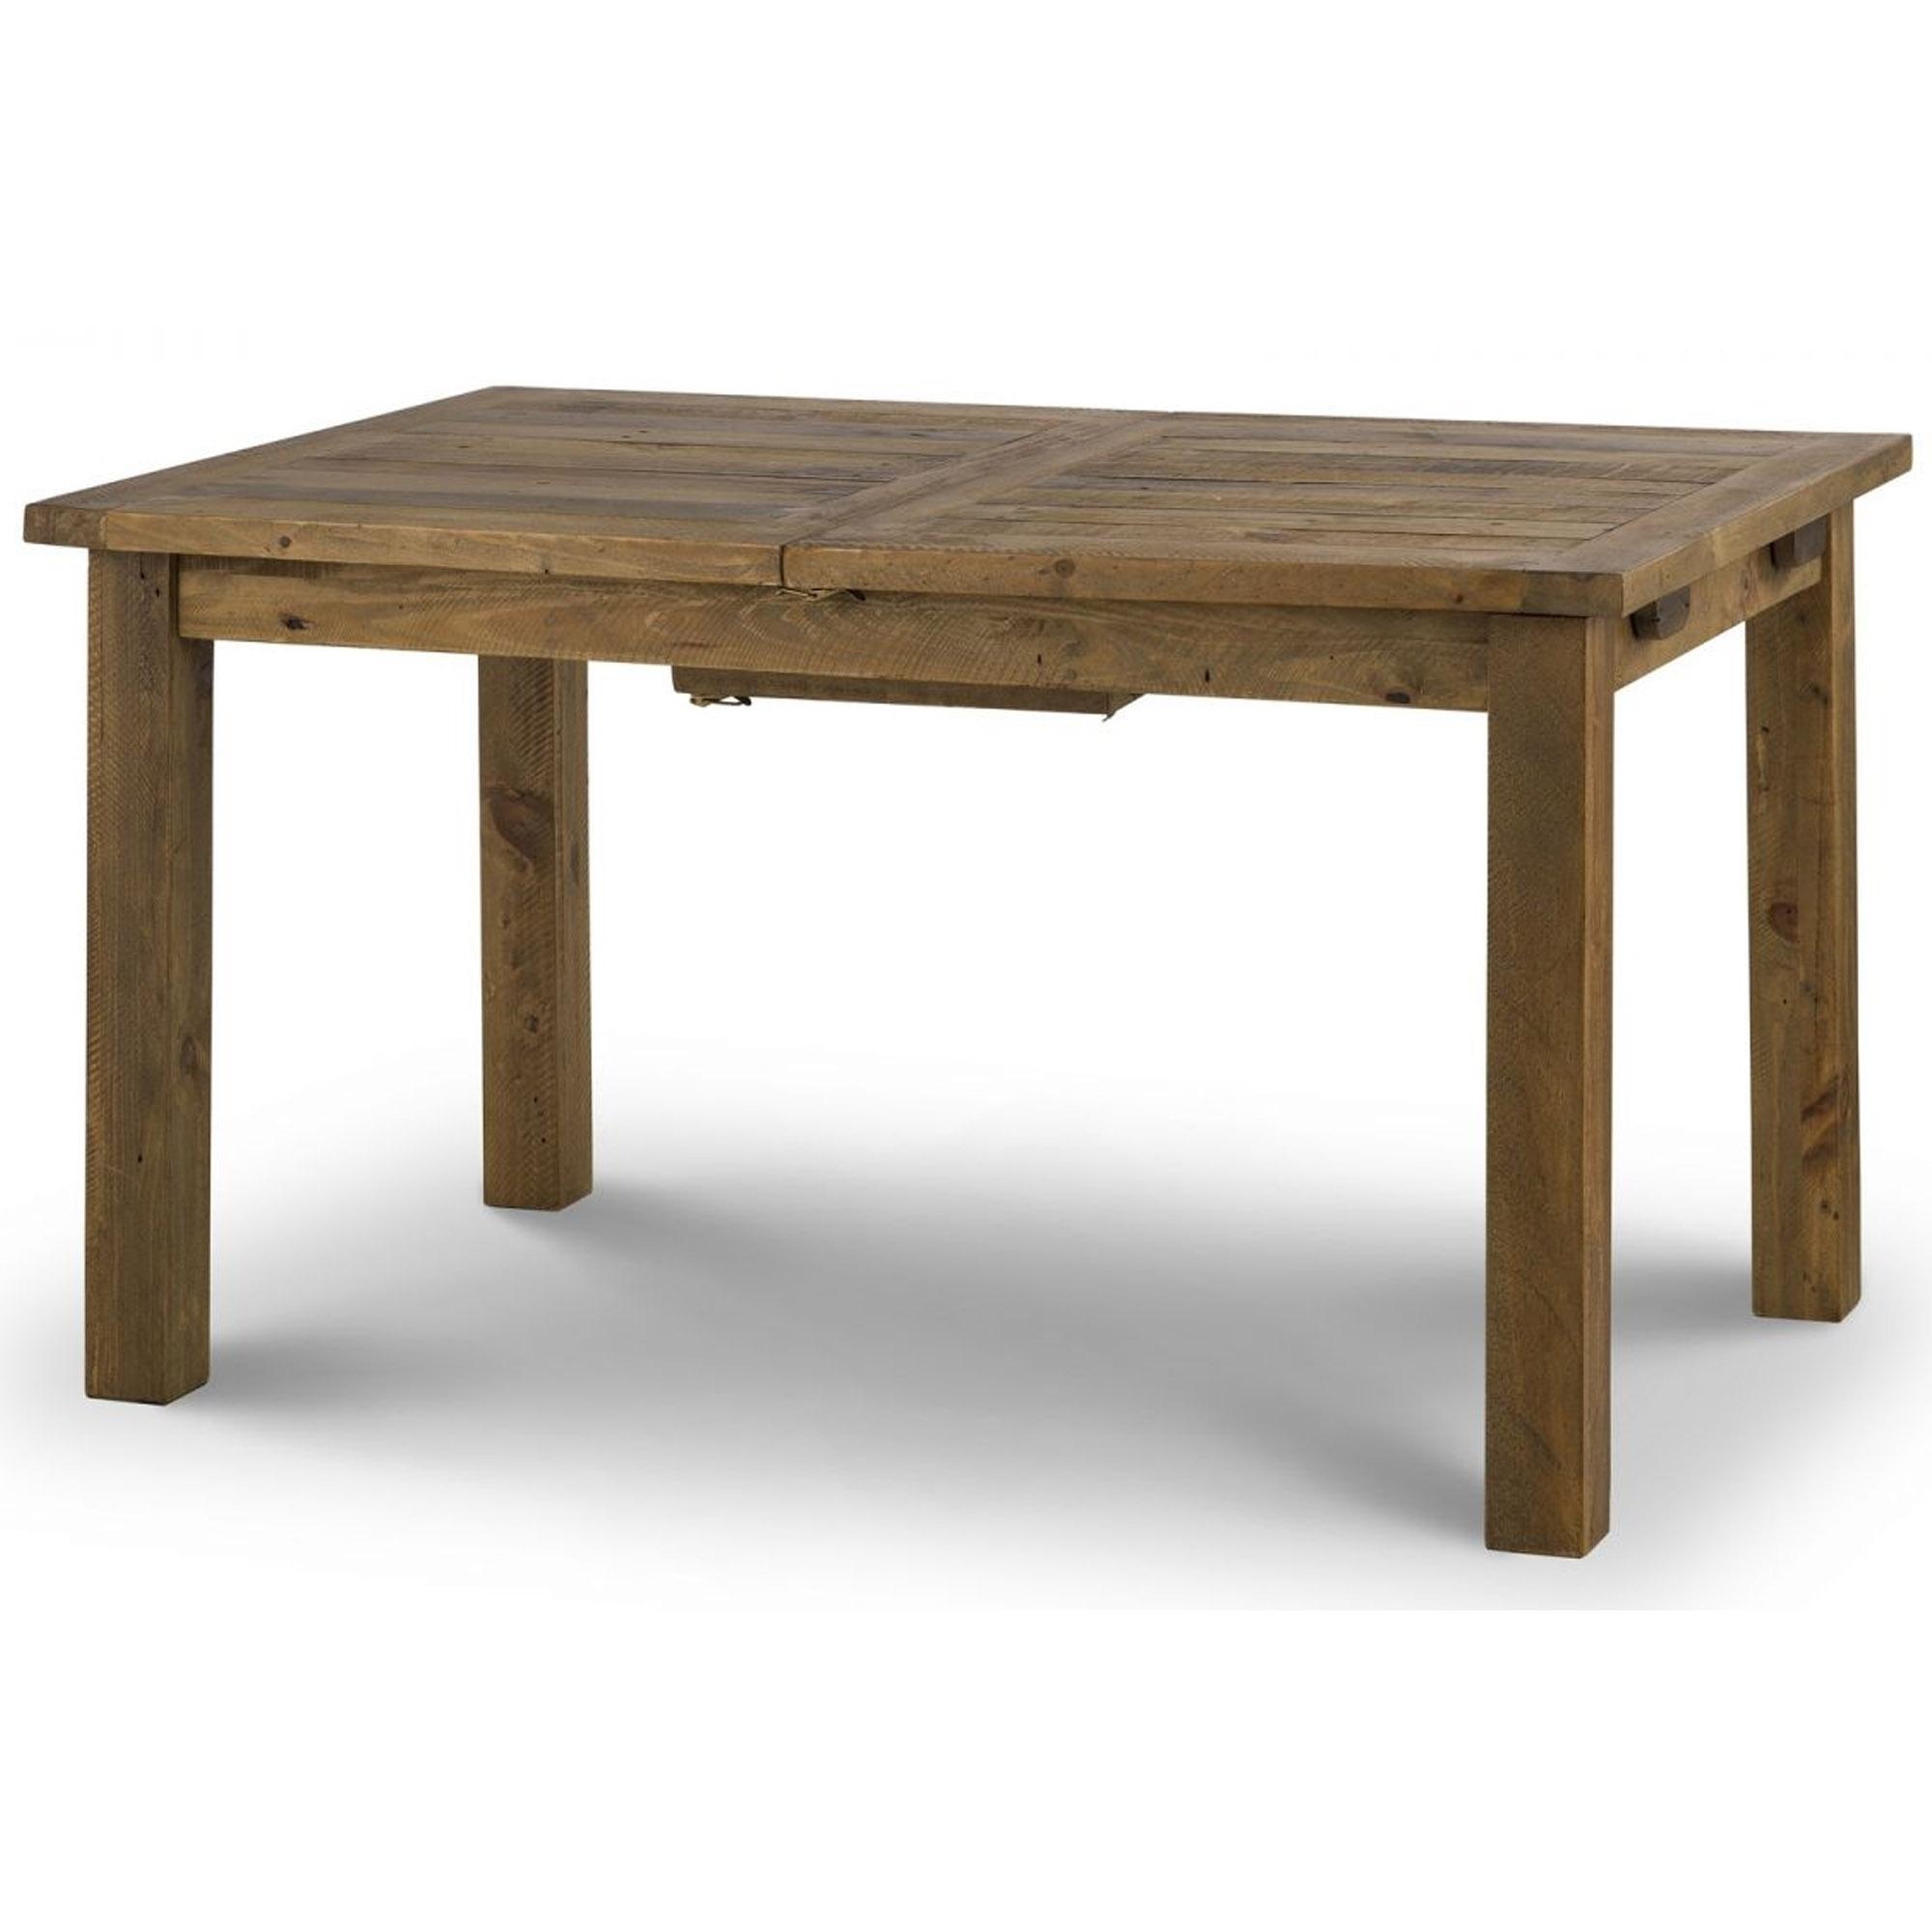 cupboard kidkraft pdx furniture baby set piece wayfair kids reviews table aspen and chair